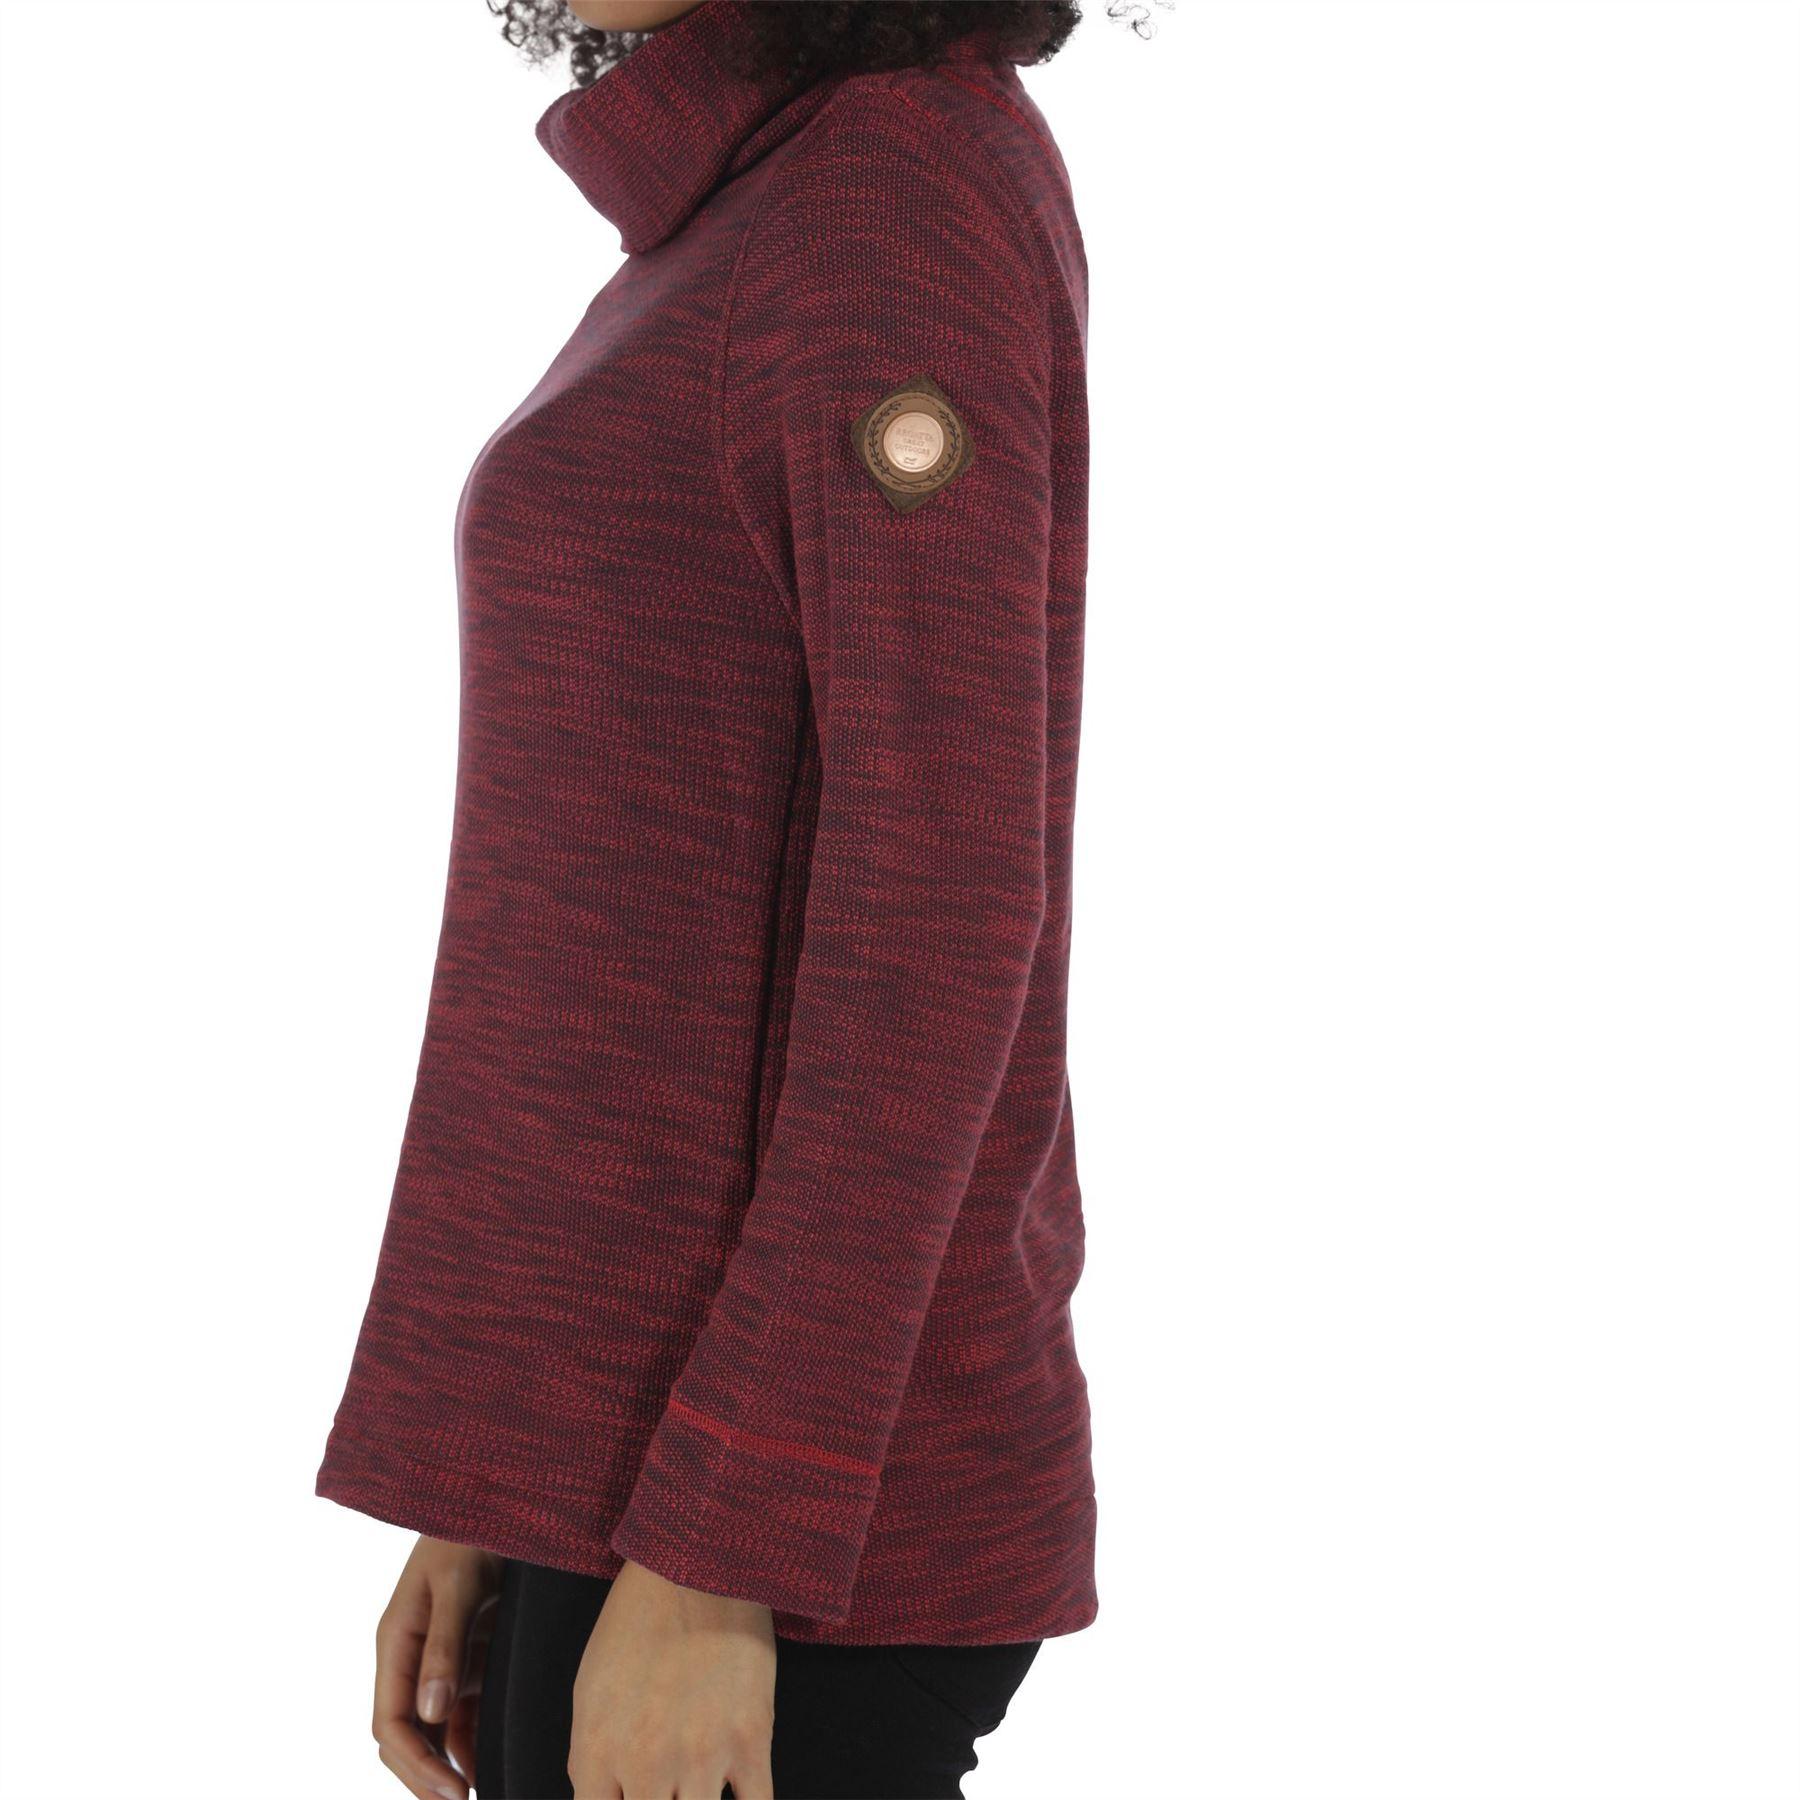 Regatta-Ceanna-Cowl-Neck-Soft-Fleece-Pull-Over-Jumper-Sweater-Top-RWA276 thumbnail 11